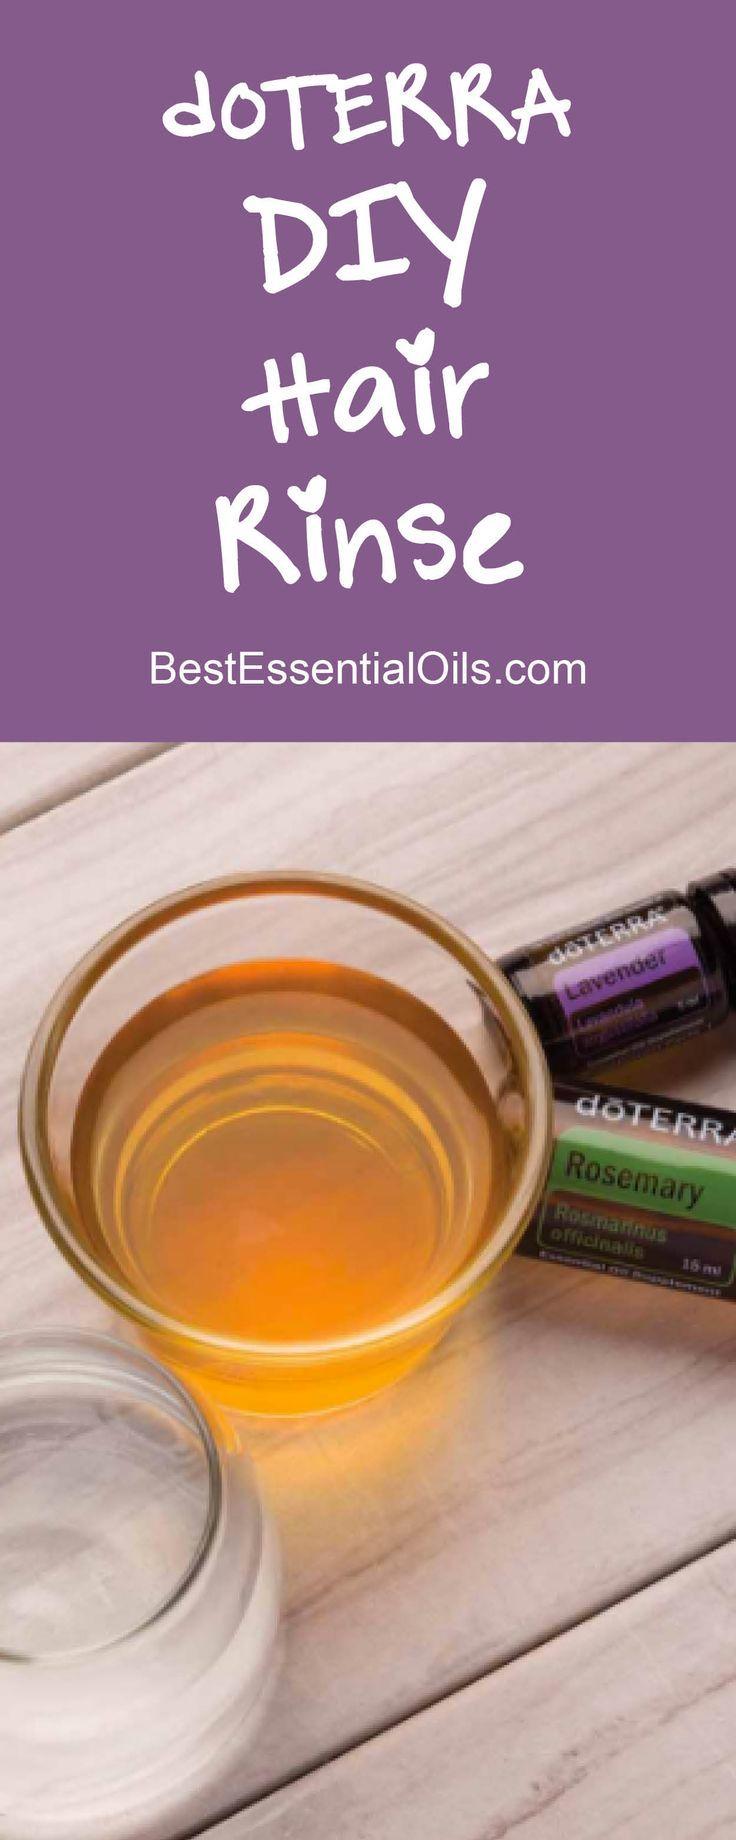 doTERRA DIY Rosemary Lavender Hair Rinse Recipe